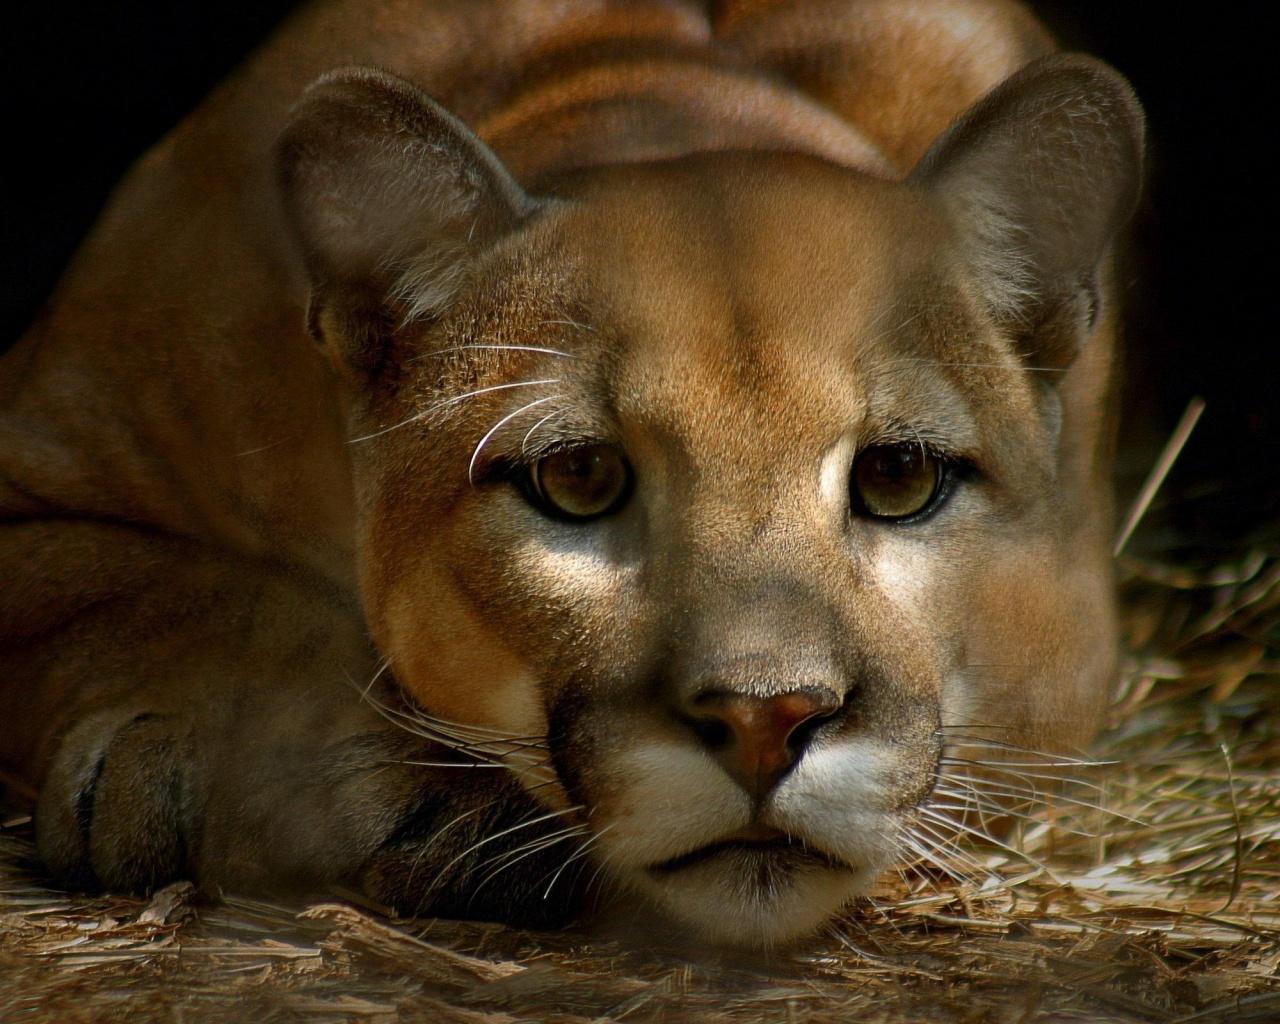 cougar-photos-8 links